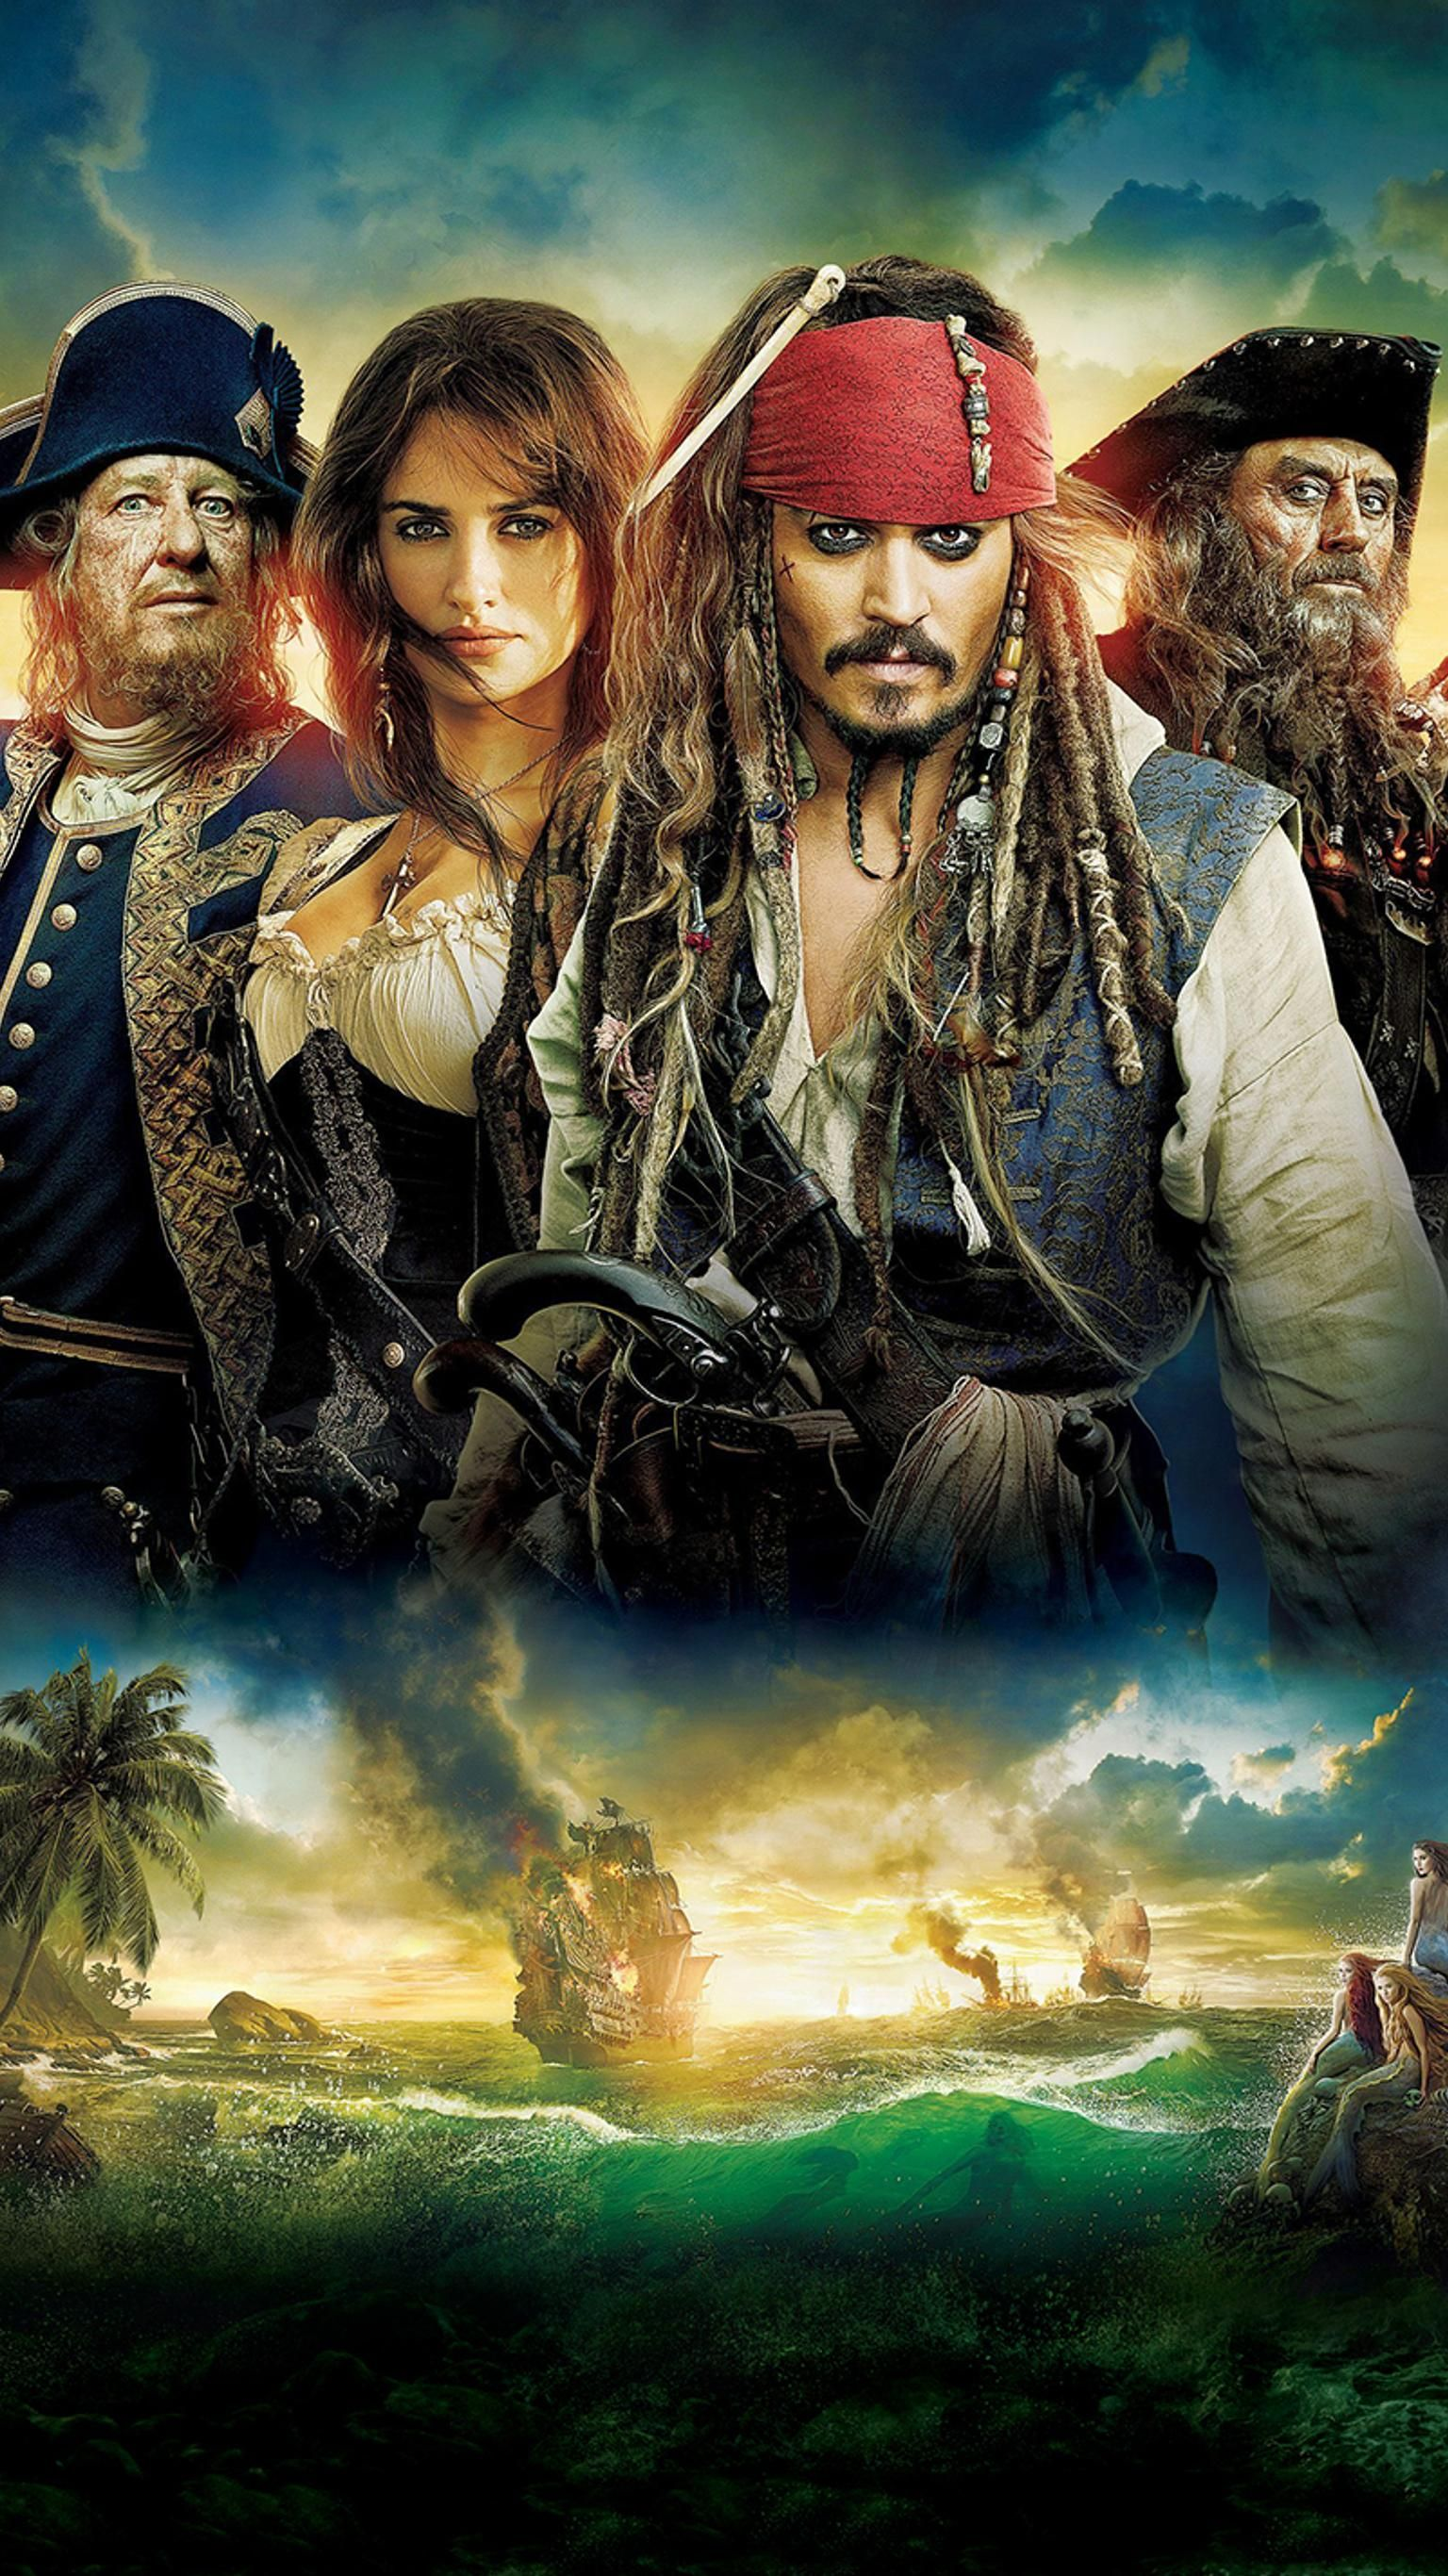 Pirates Of The Caribbean On Stranger Tides 2011 Phone Wallpaper